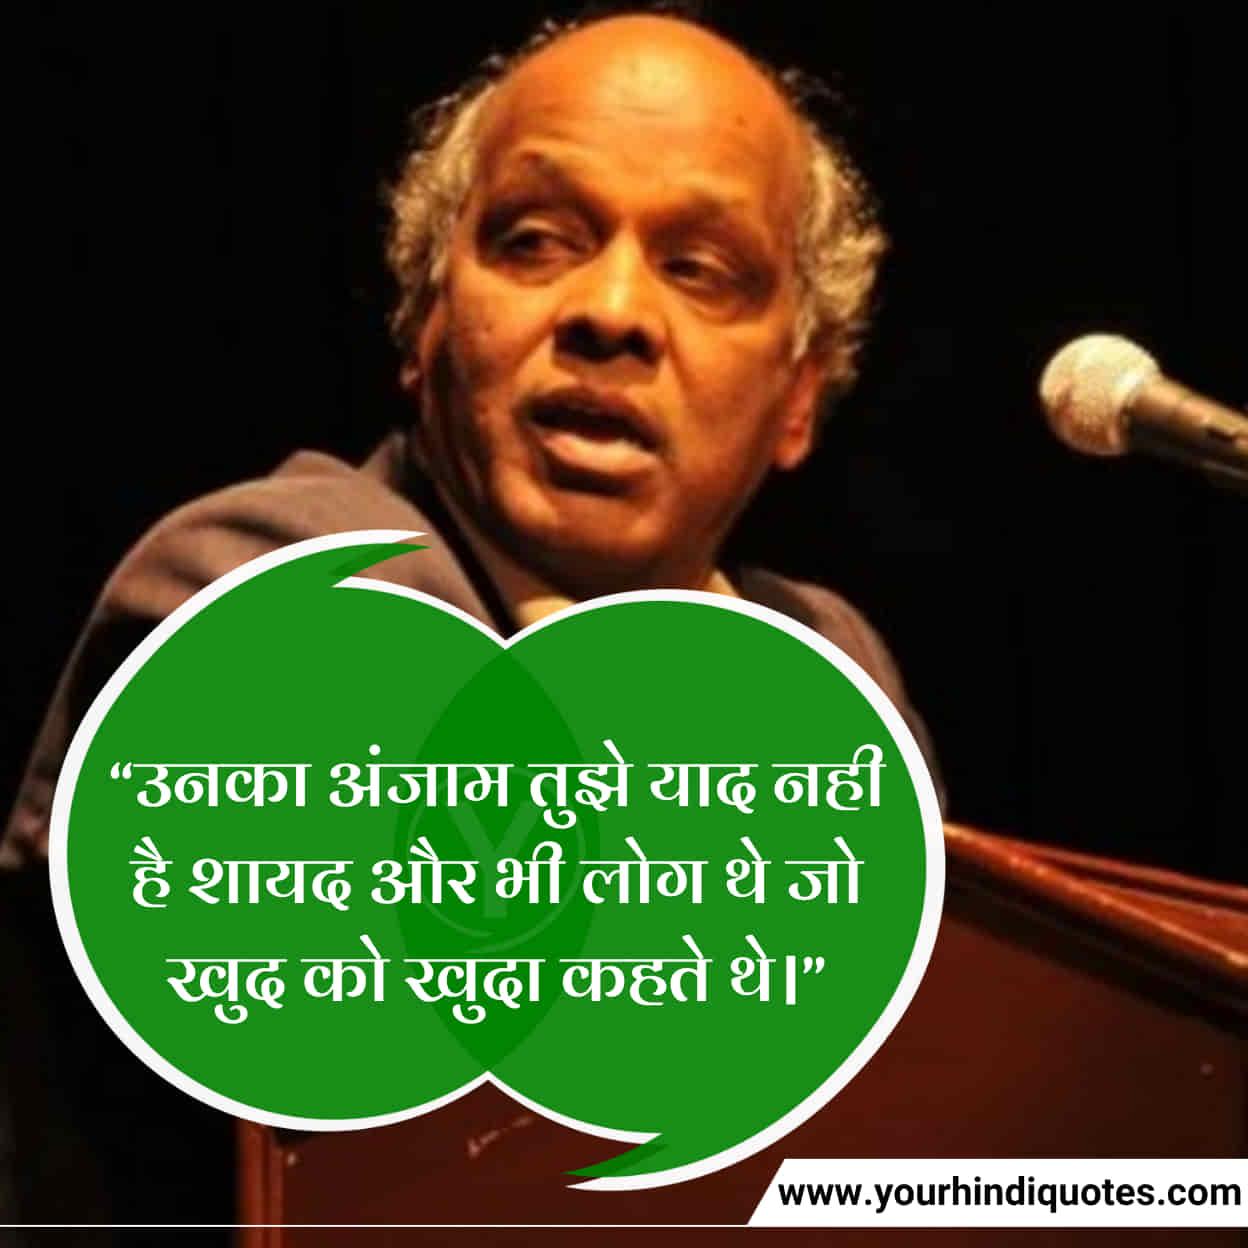 2 Line Rahat Indori Shayari